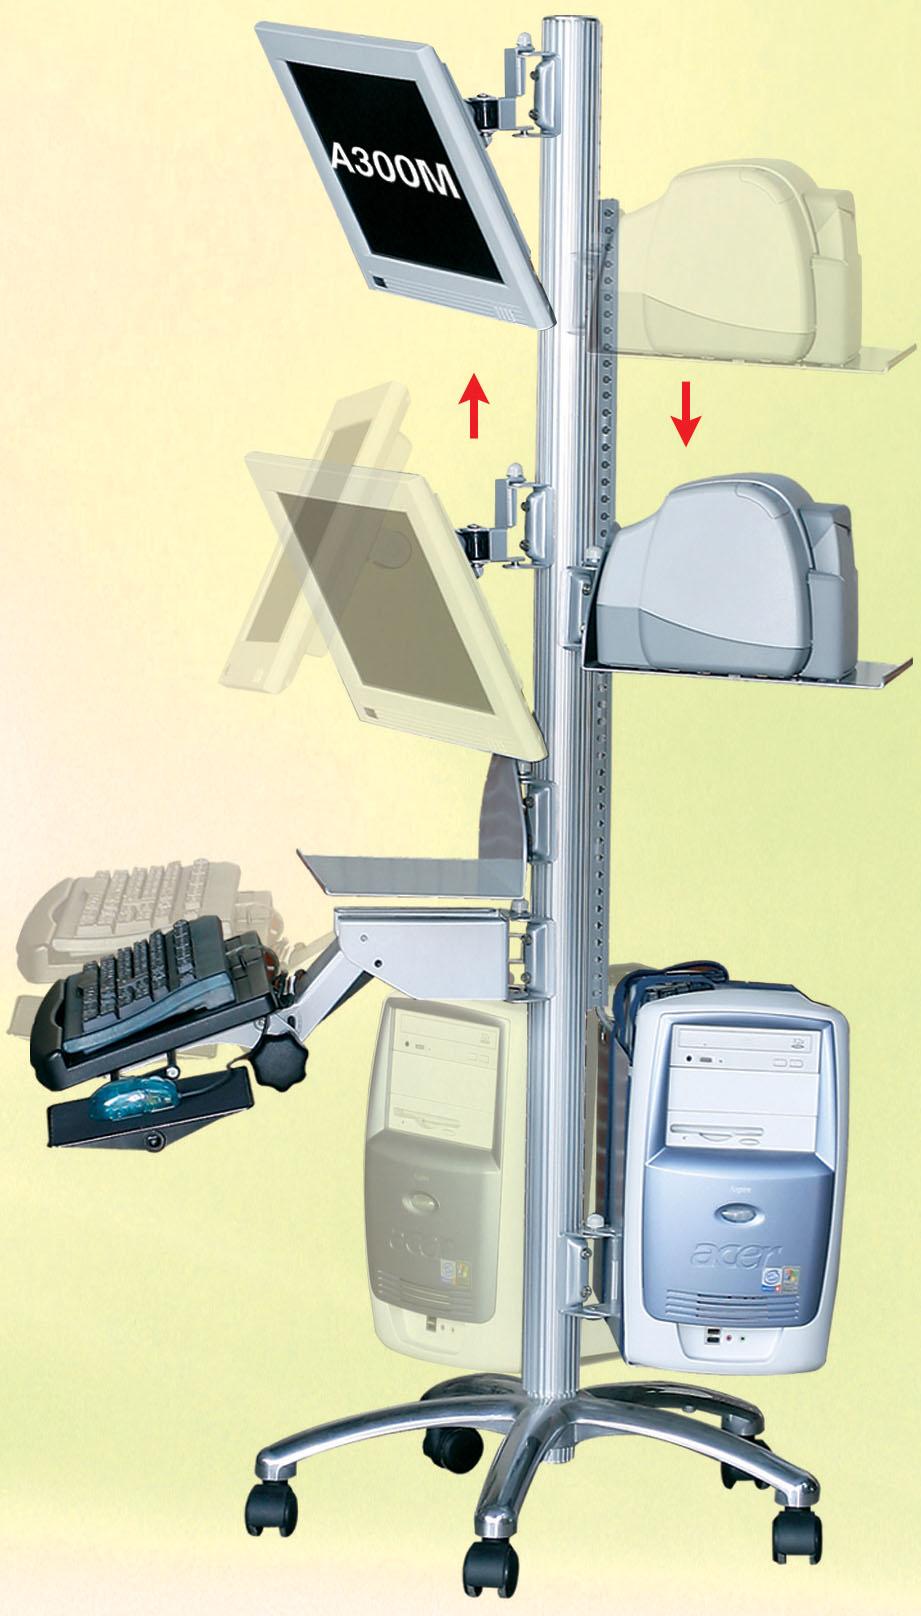 Mobile Work Station | Desk mounts | Office | HowLo (the bracket people